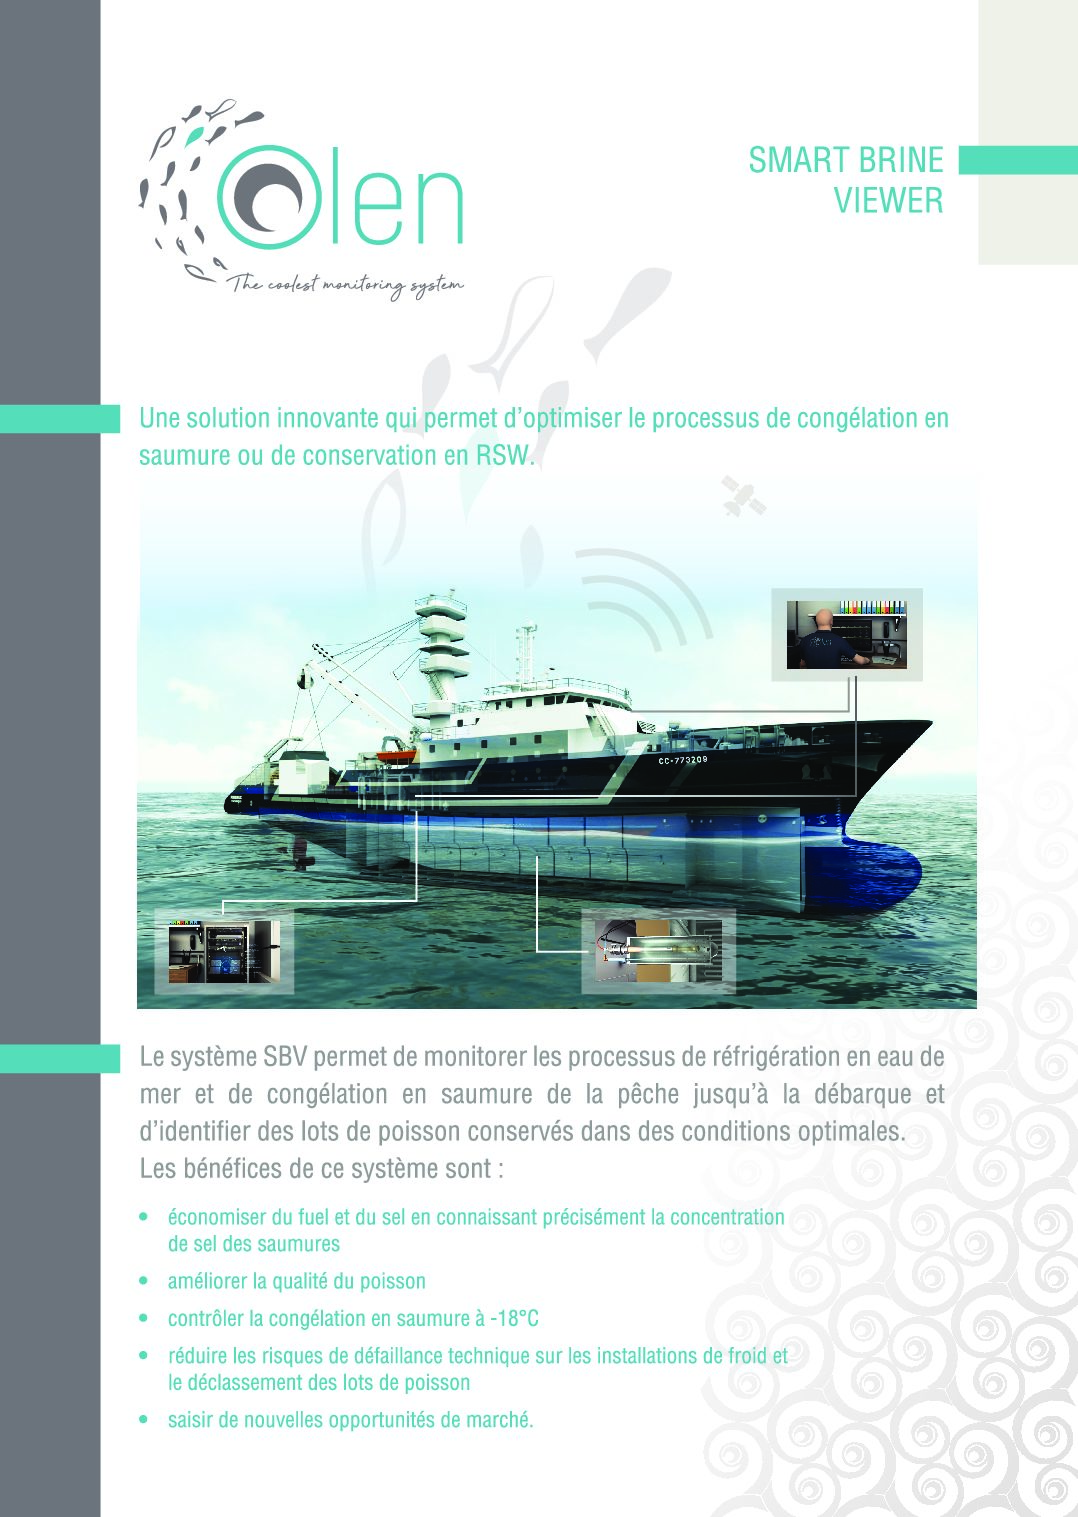 SMART BRINE VIEWER FR pdf - Produits